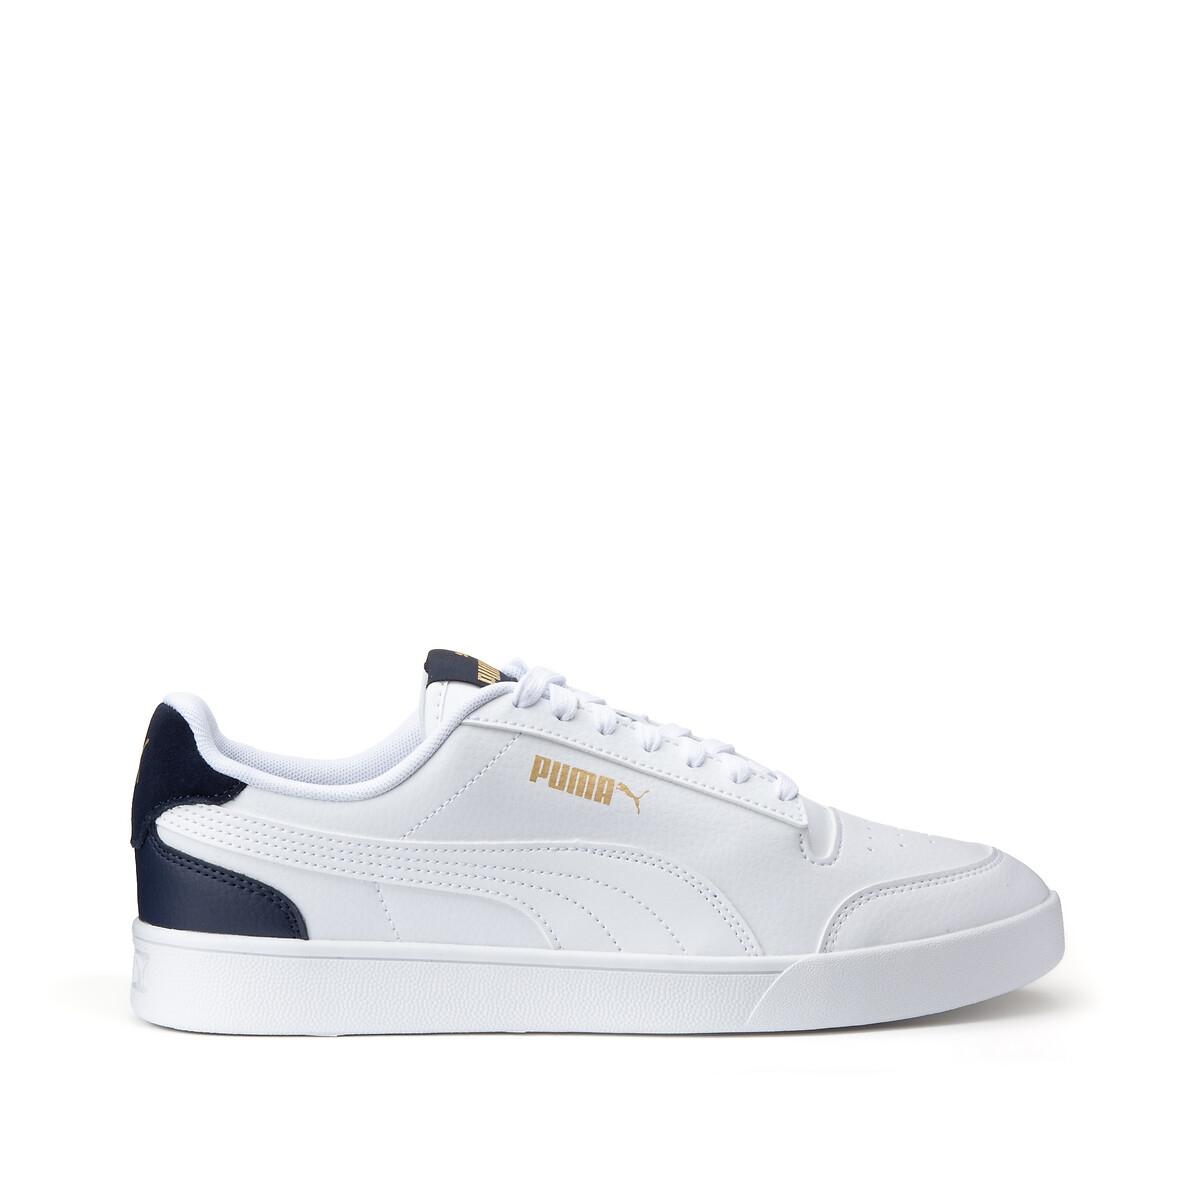 Puma Shuffle sneakers wit/donkerblauw/goud online kopen